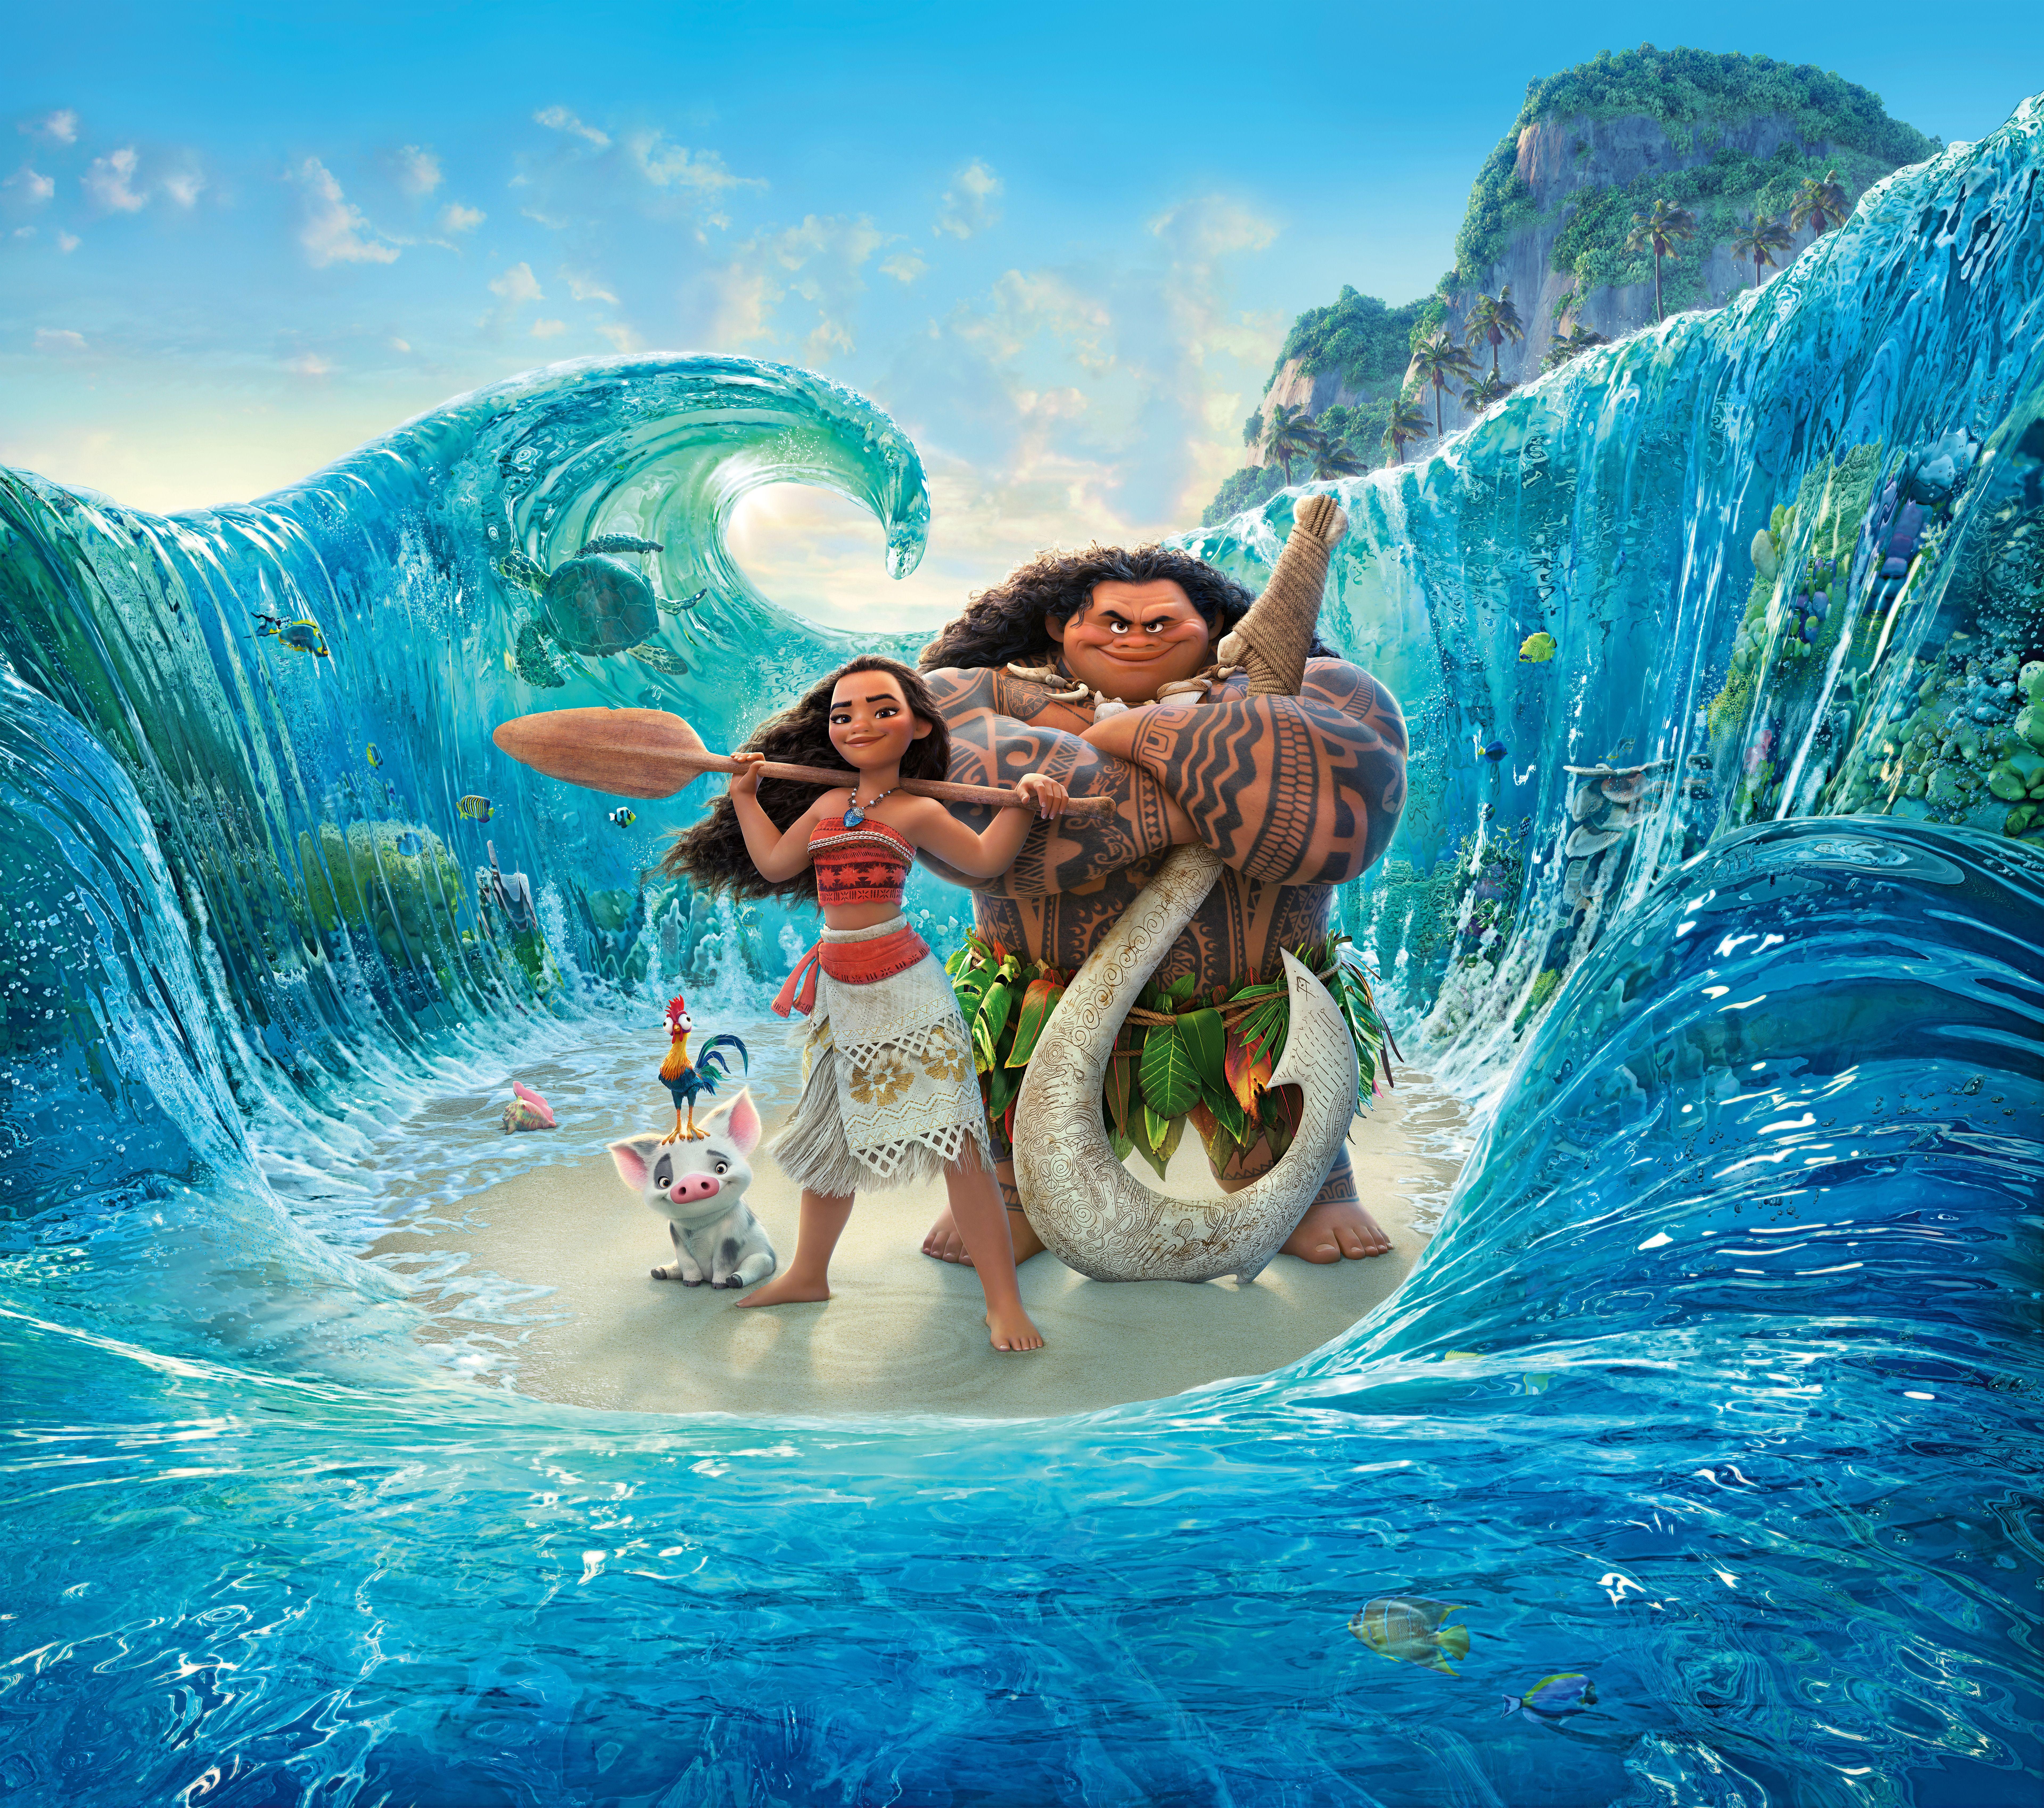 Disney Moana Wallpapers - Top Free